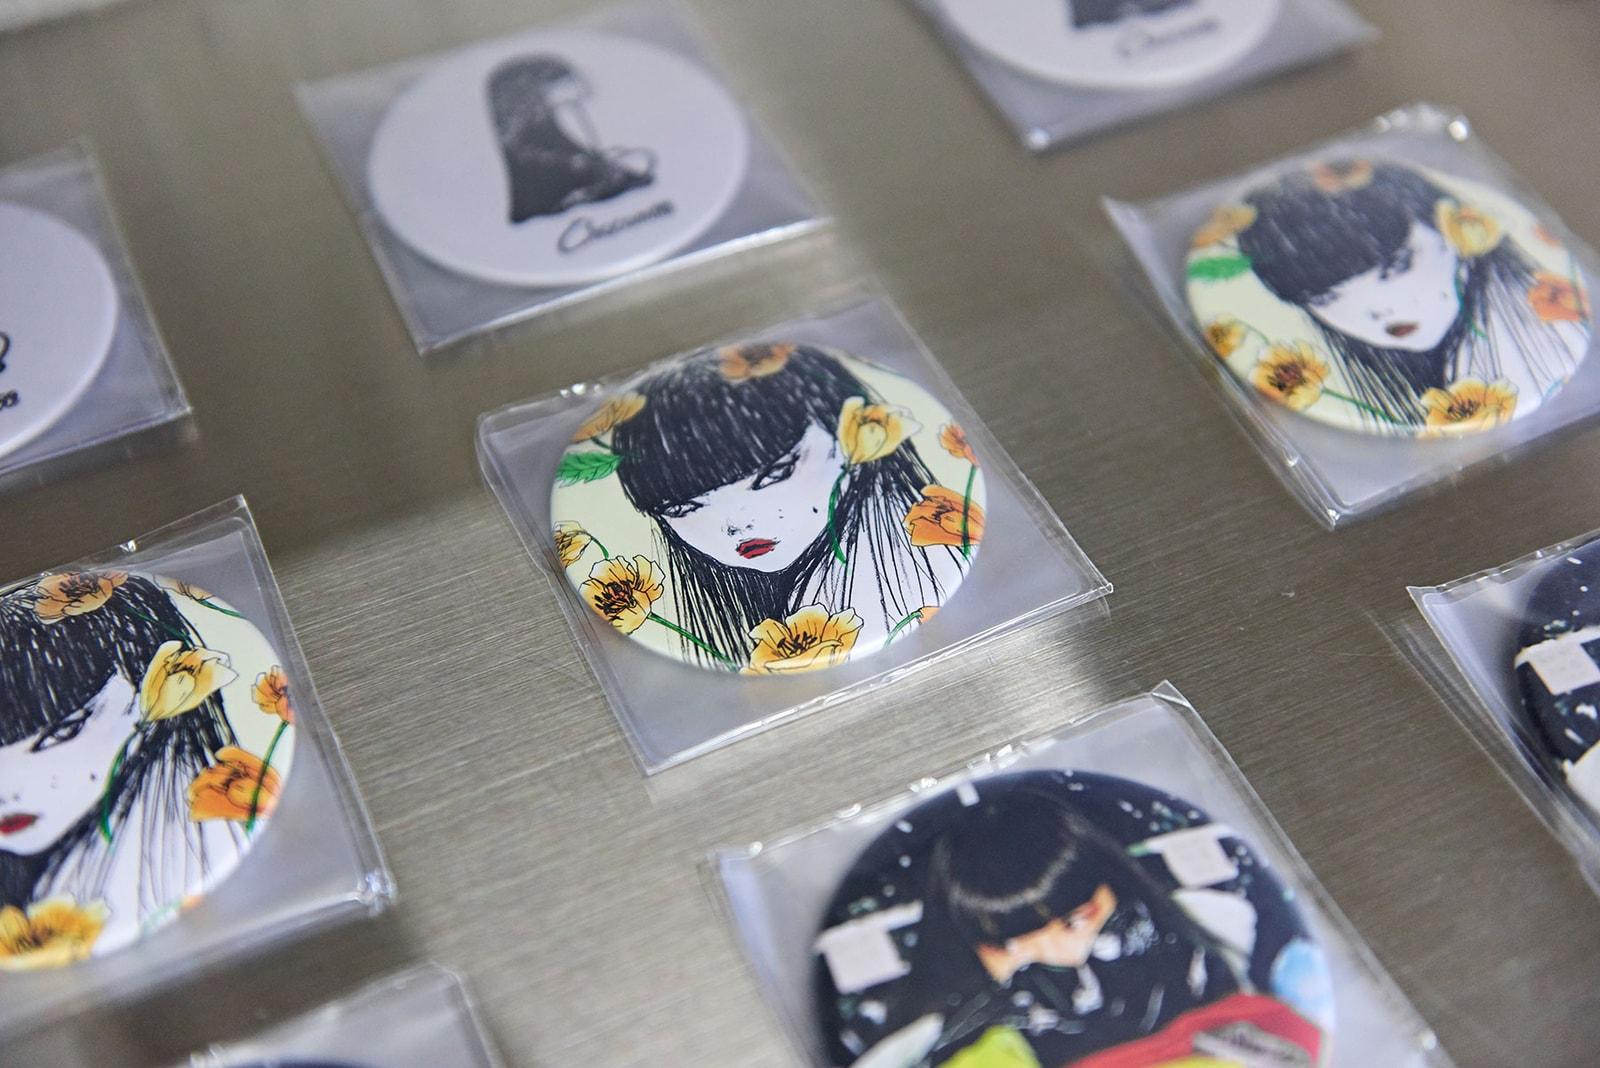 Streetsnaps Kozue Akimoto Tokyo Fashion Seoul Korea Dadaism Club Dada pic showroom